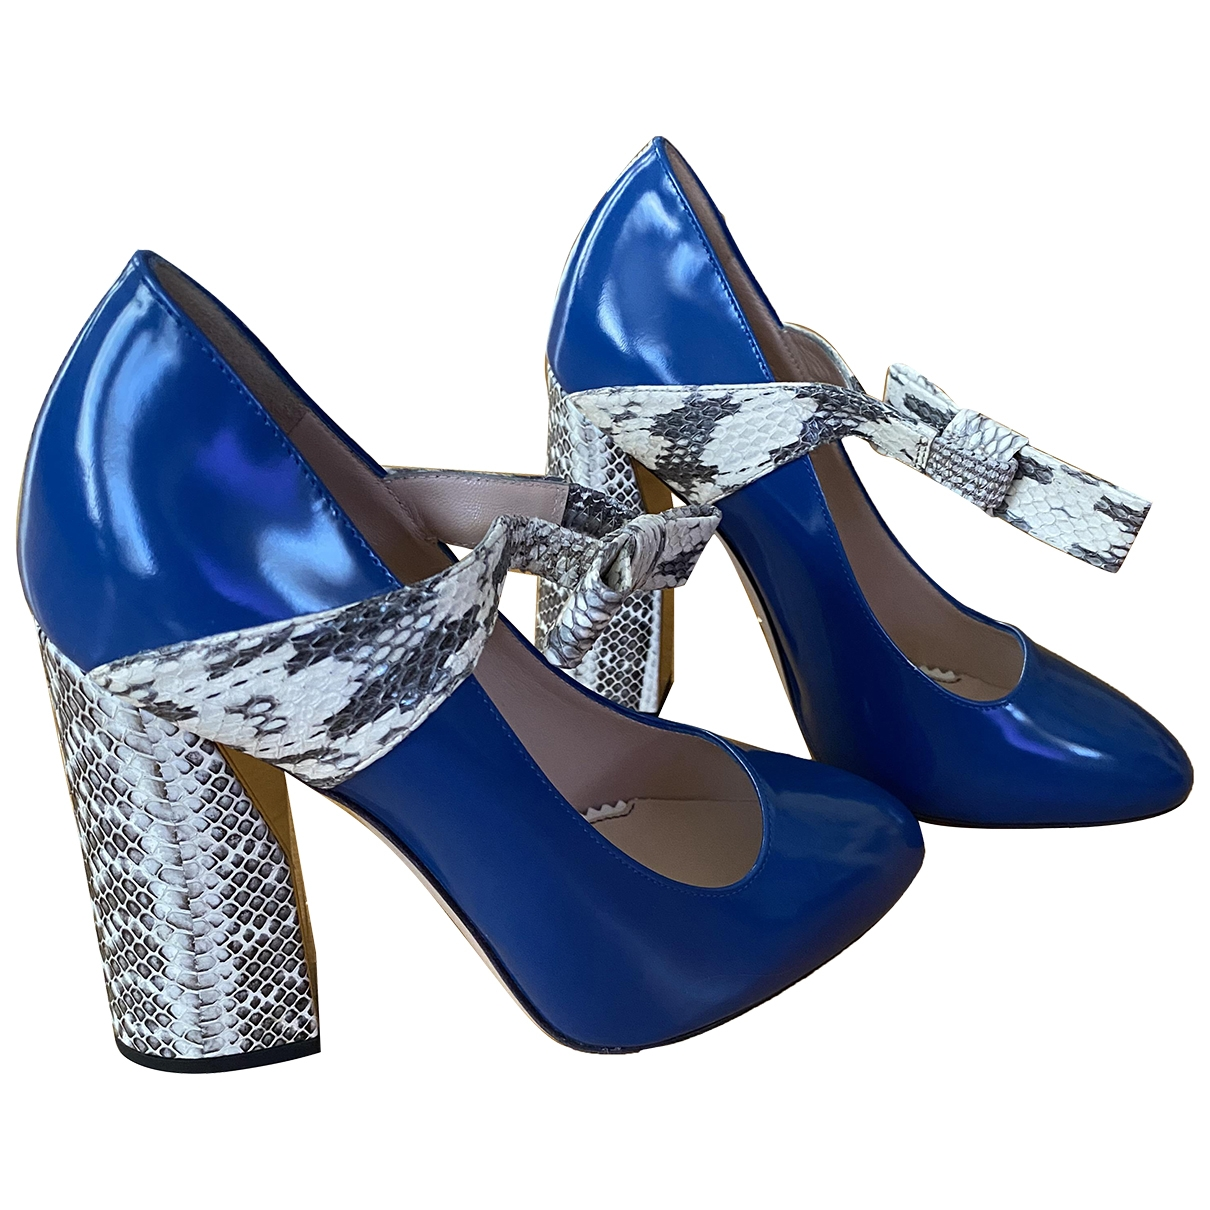 Gucci \N Pumps in  Blau Lackleder